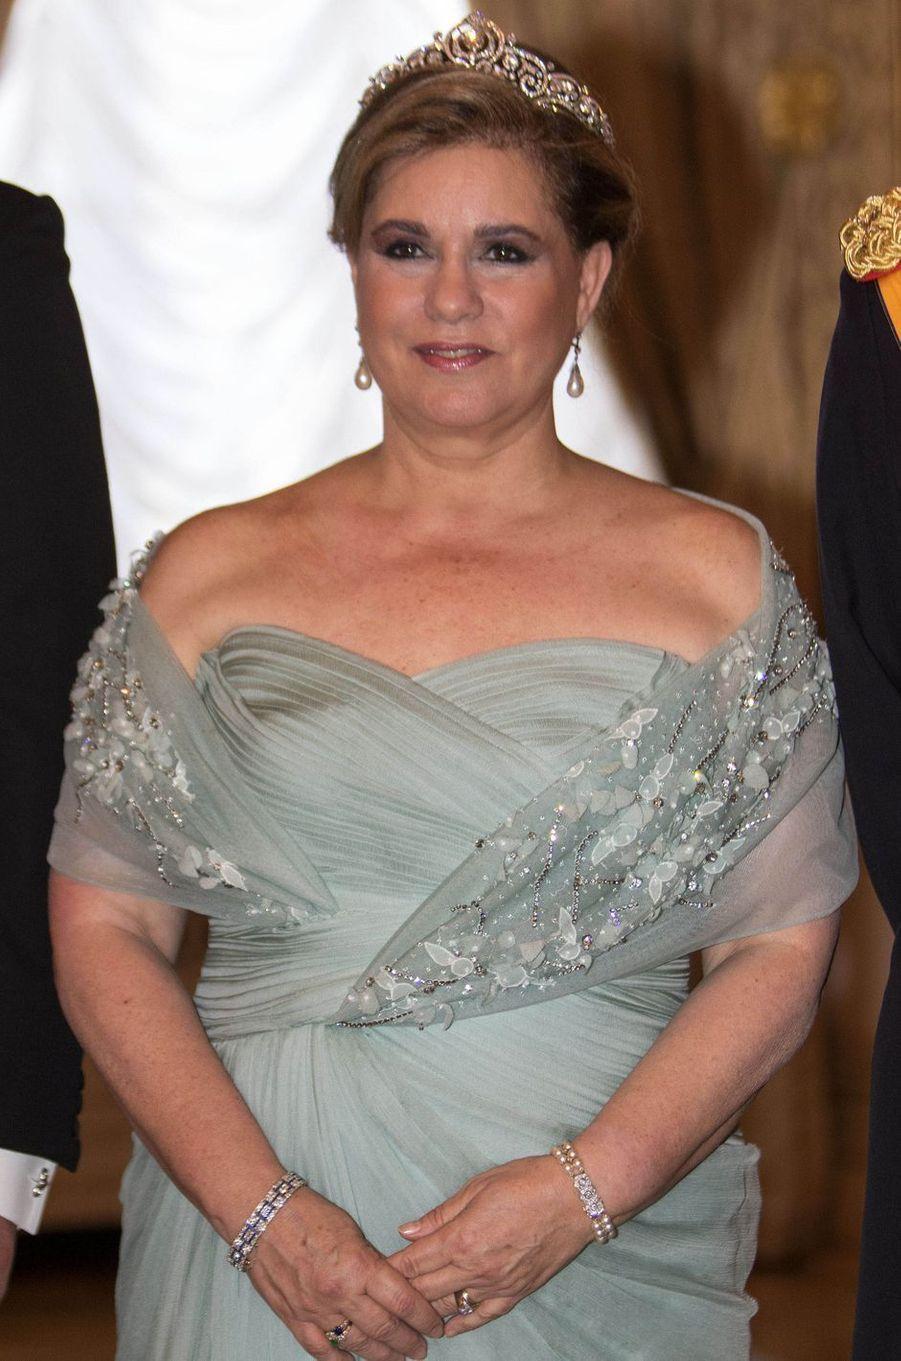 La grande-duchesse Maria Teresa de Luxembourg à Luxembourg, le 23 juin 2016